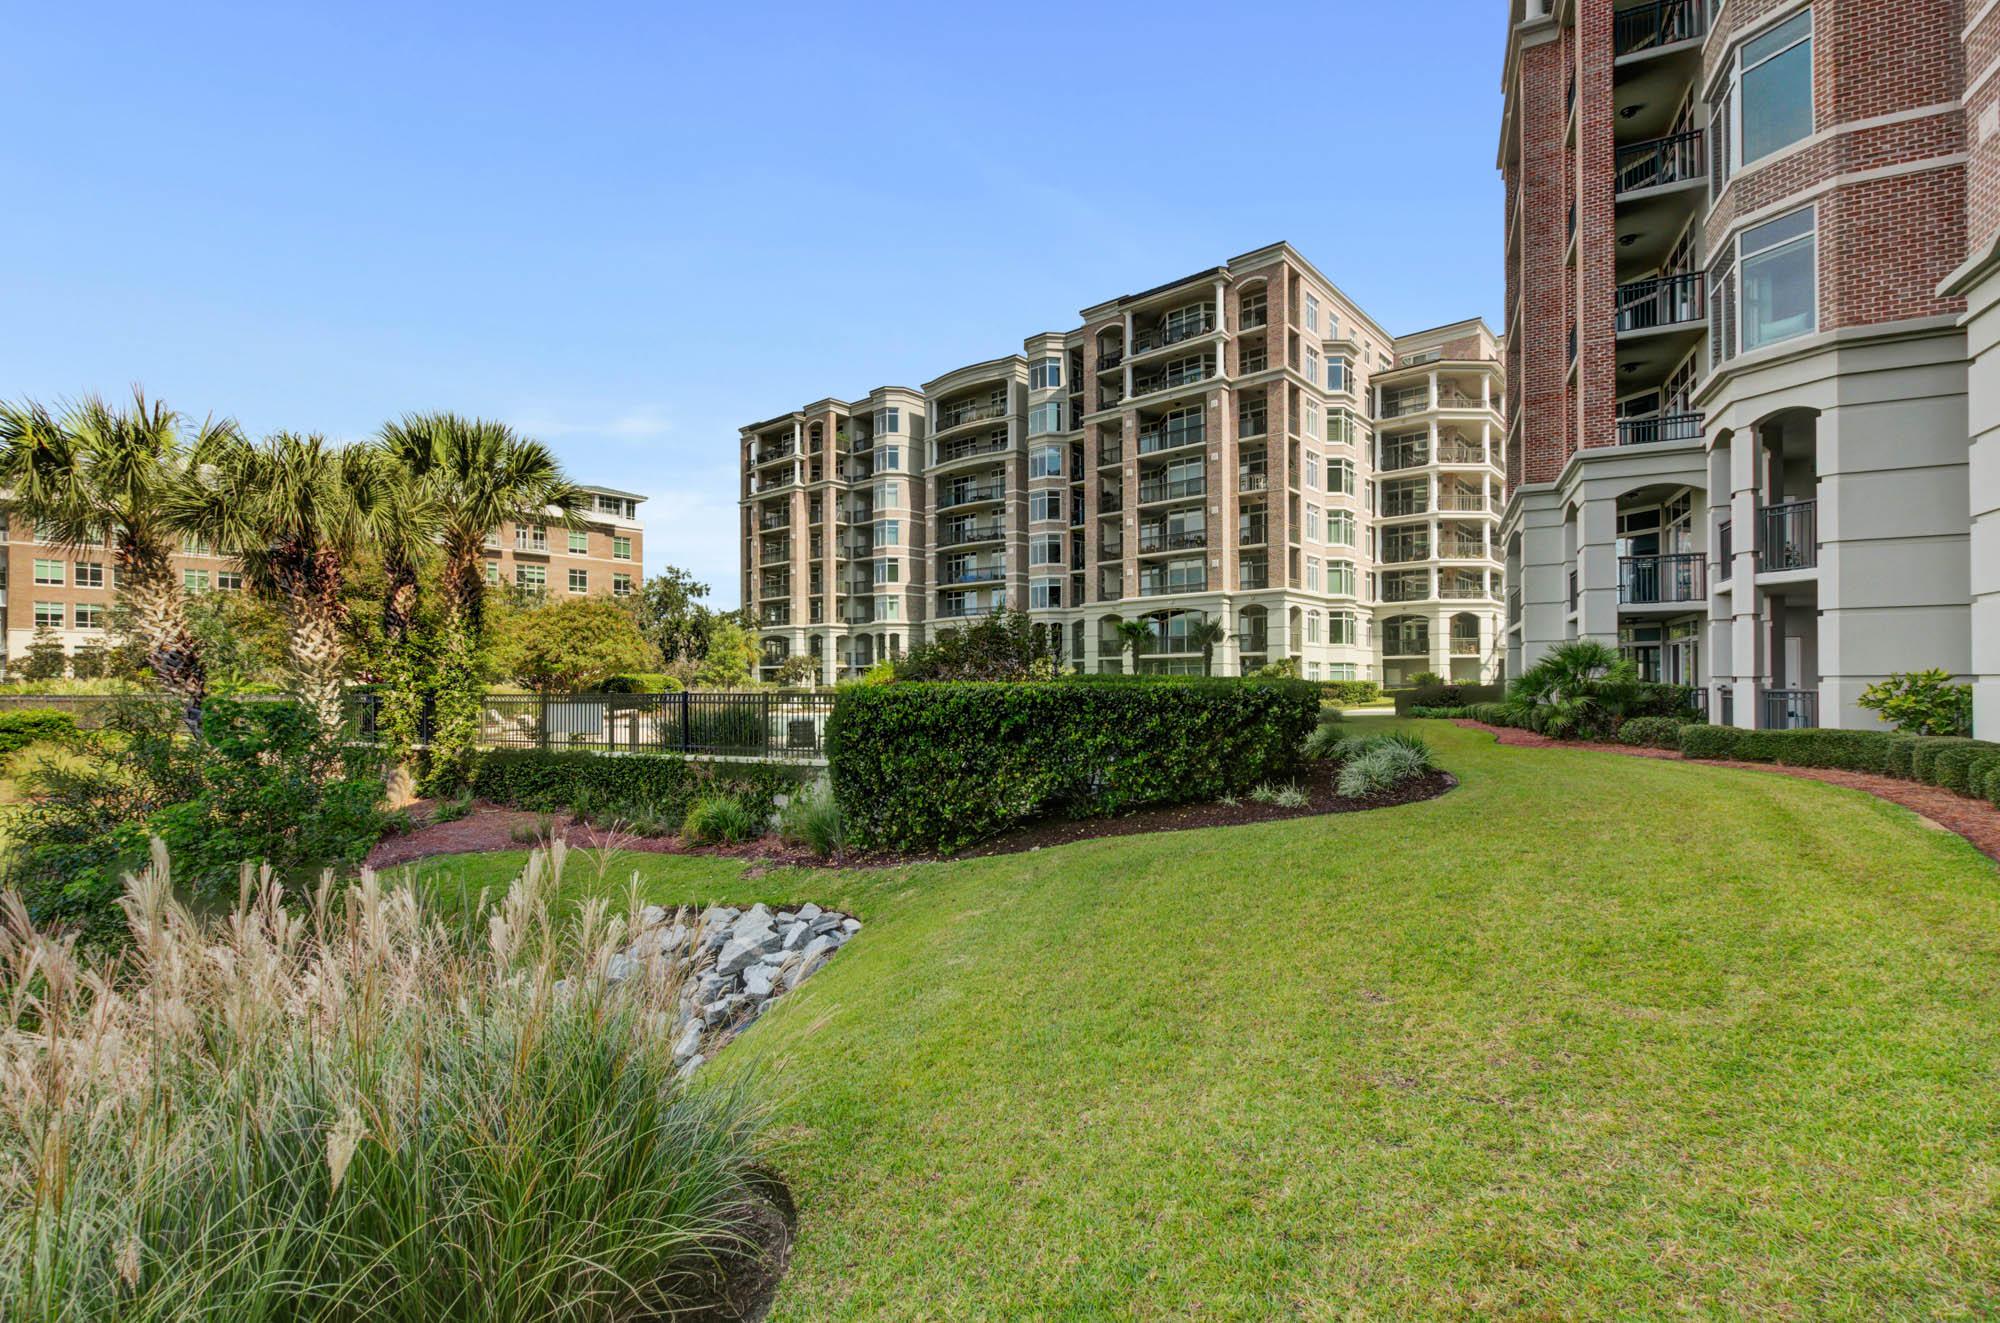 Renaissance On Chas Harbor Homes For Sale - 231 Plaza, Mount Pleasant, SC - 25